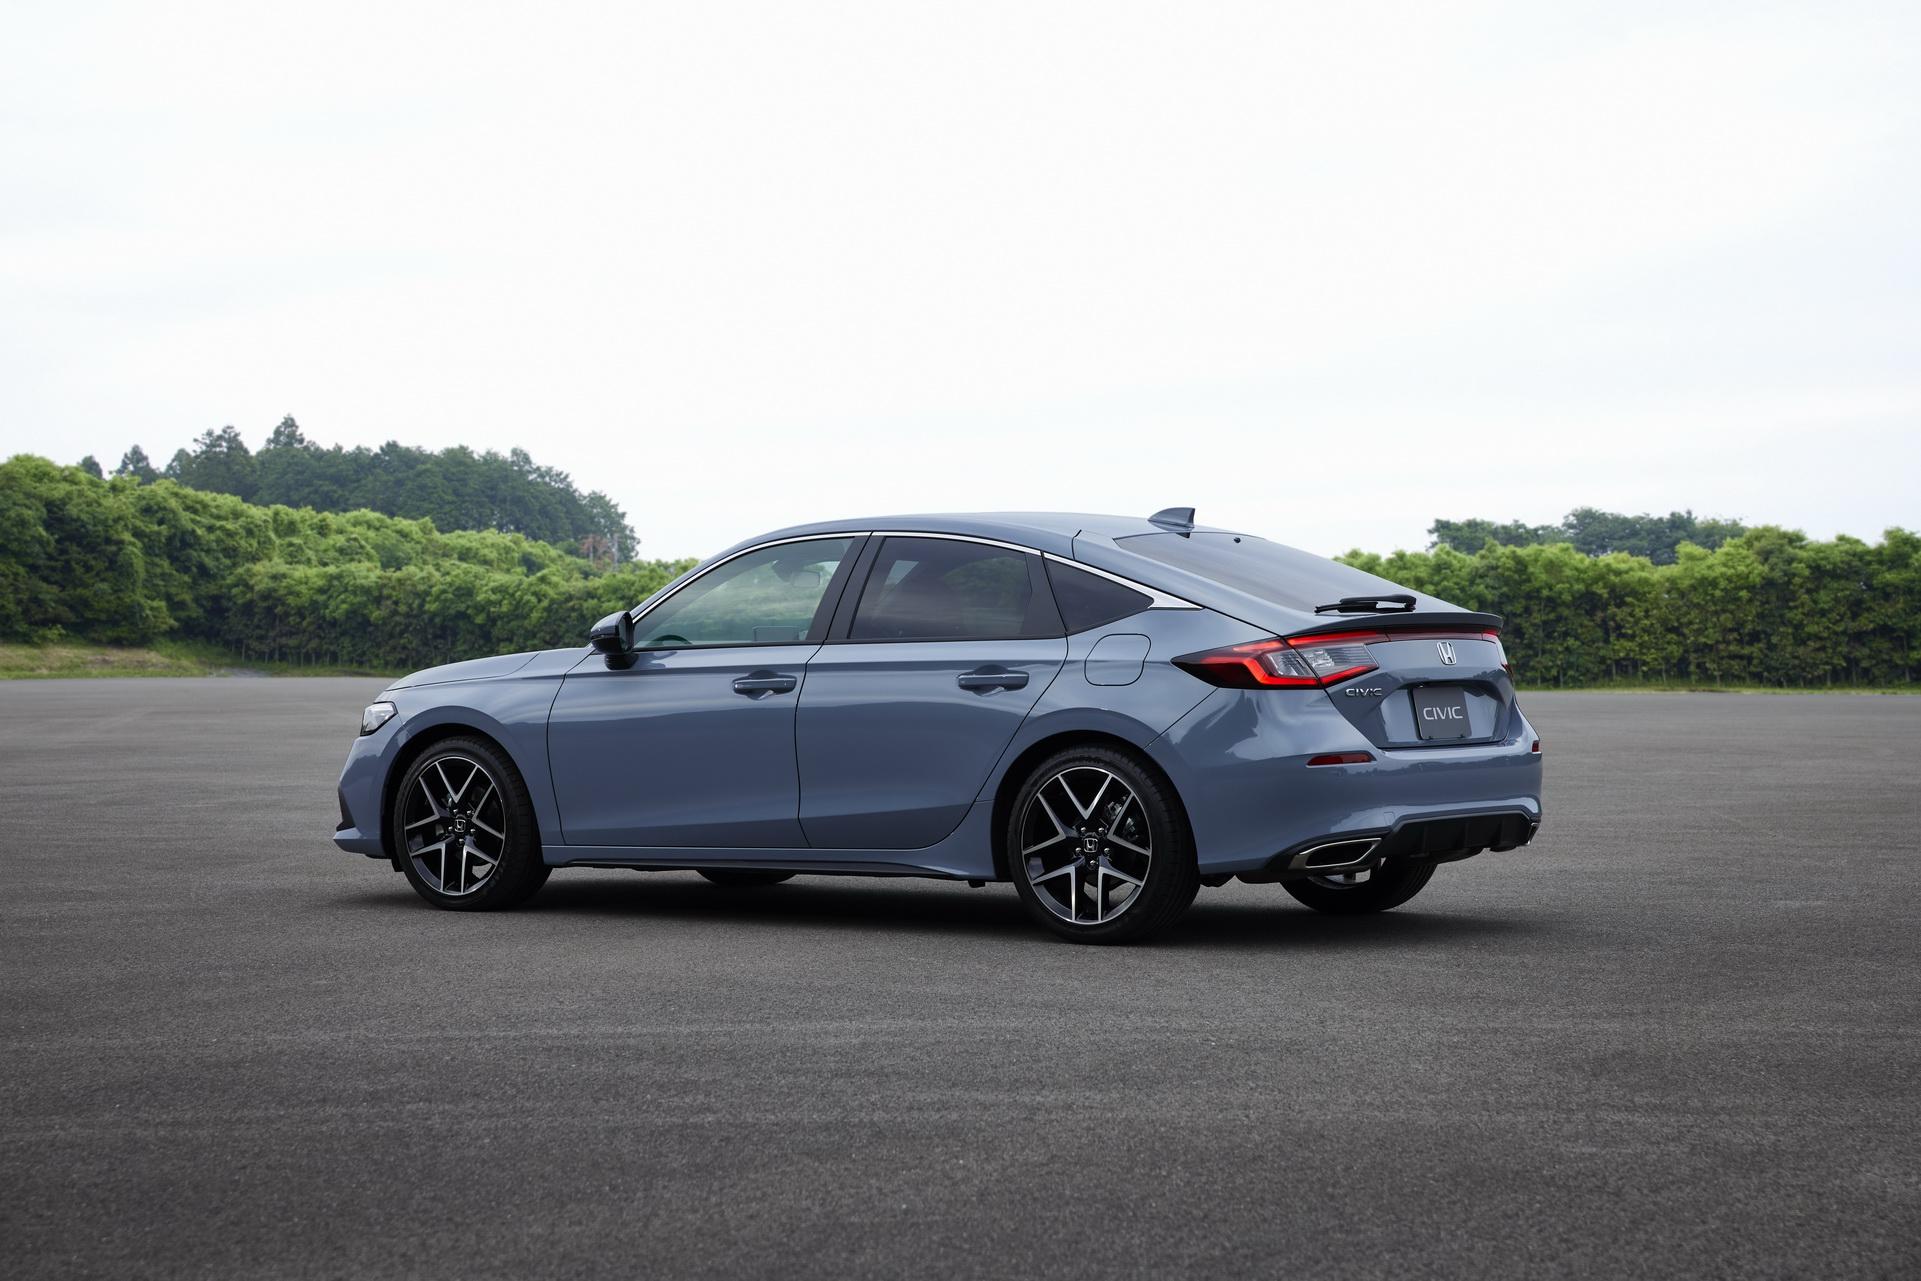 Honda-Civic-hatchback-13